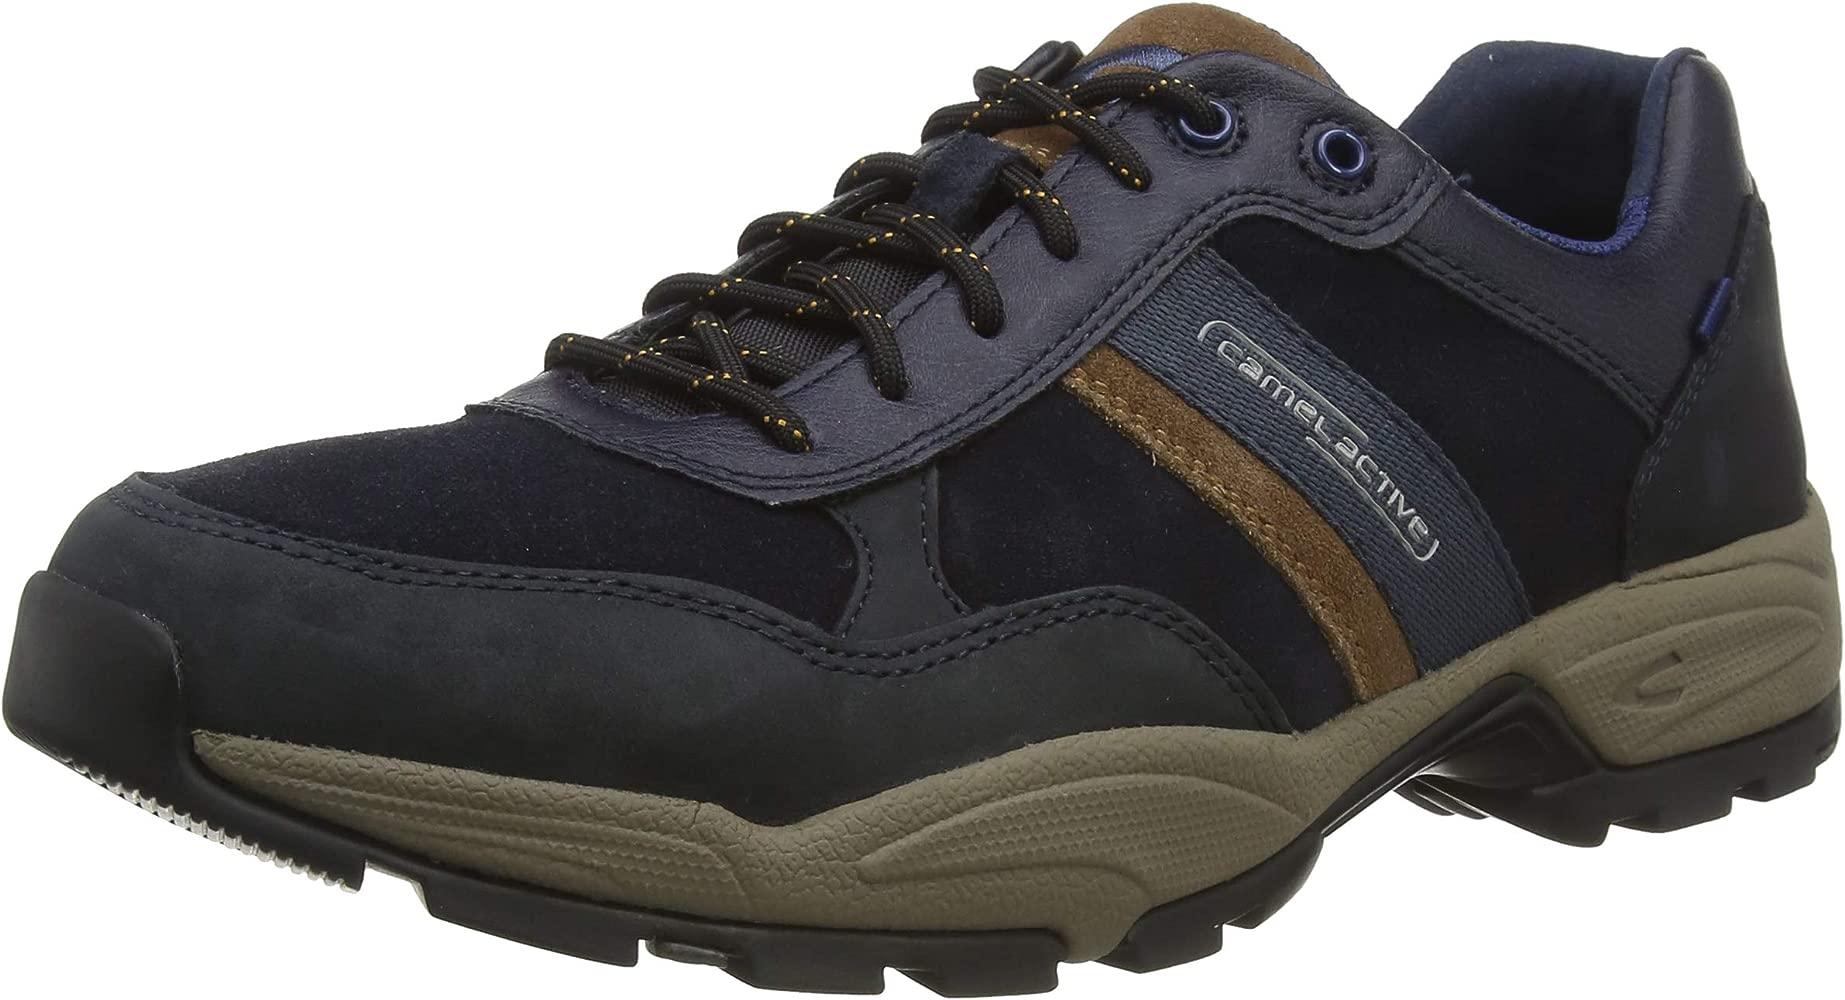 Men's Evolution 30 Outdoor Shoes